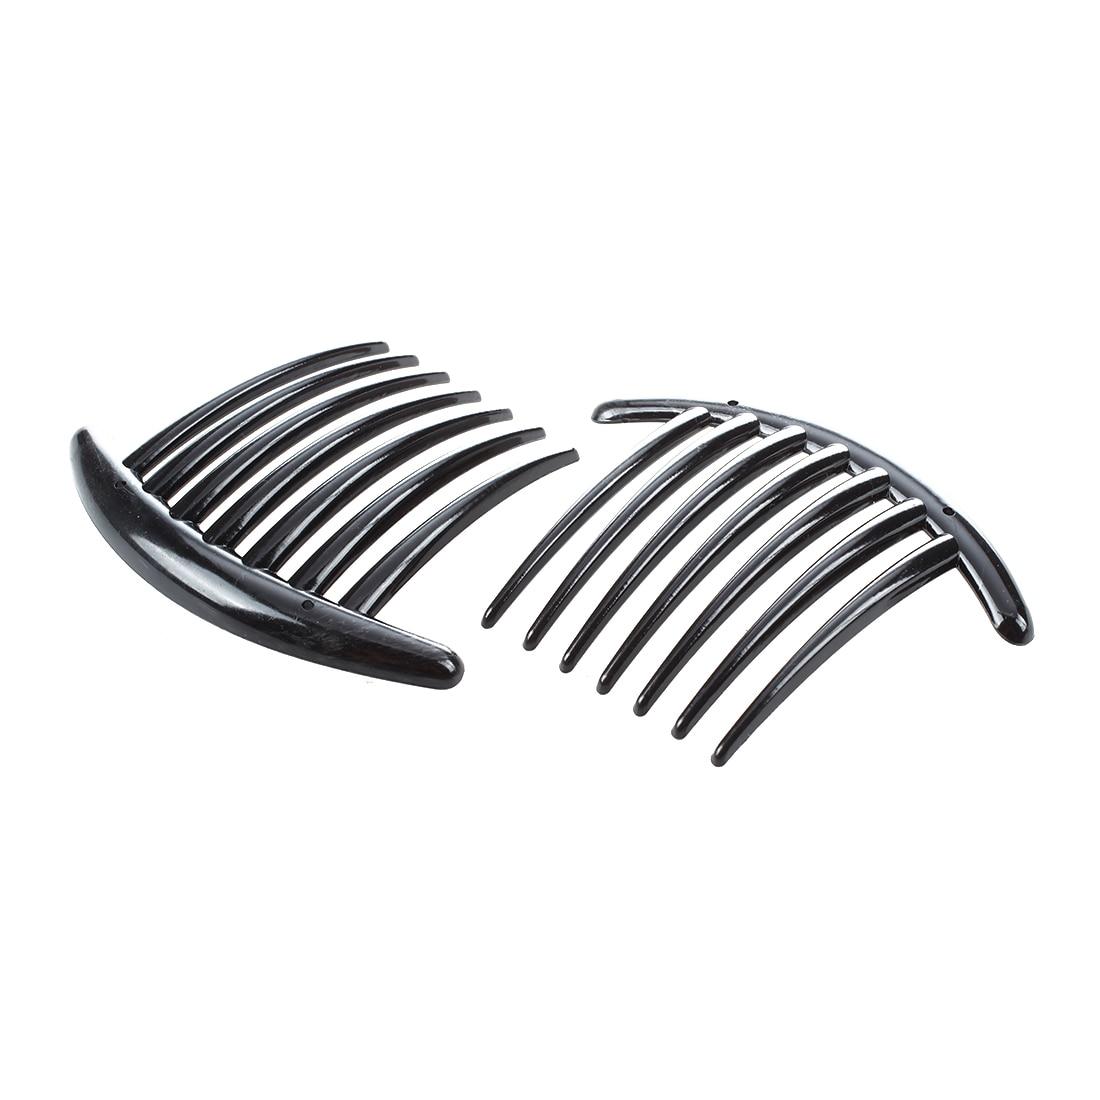 HTHL 2pcs Hair Comb Pin Accessories Plastic Women Lady